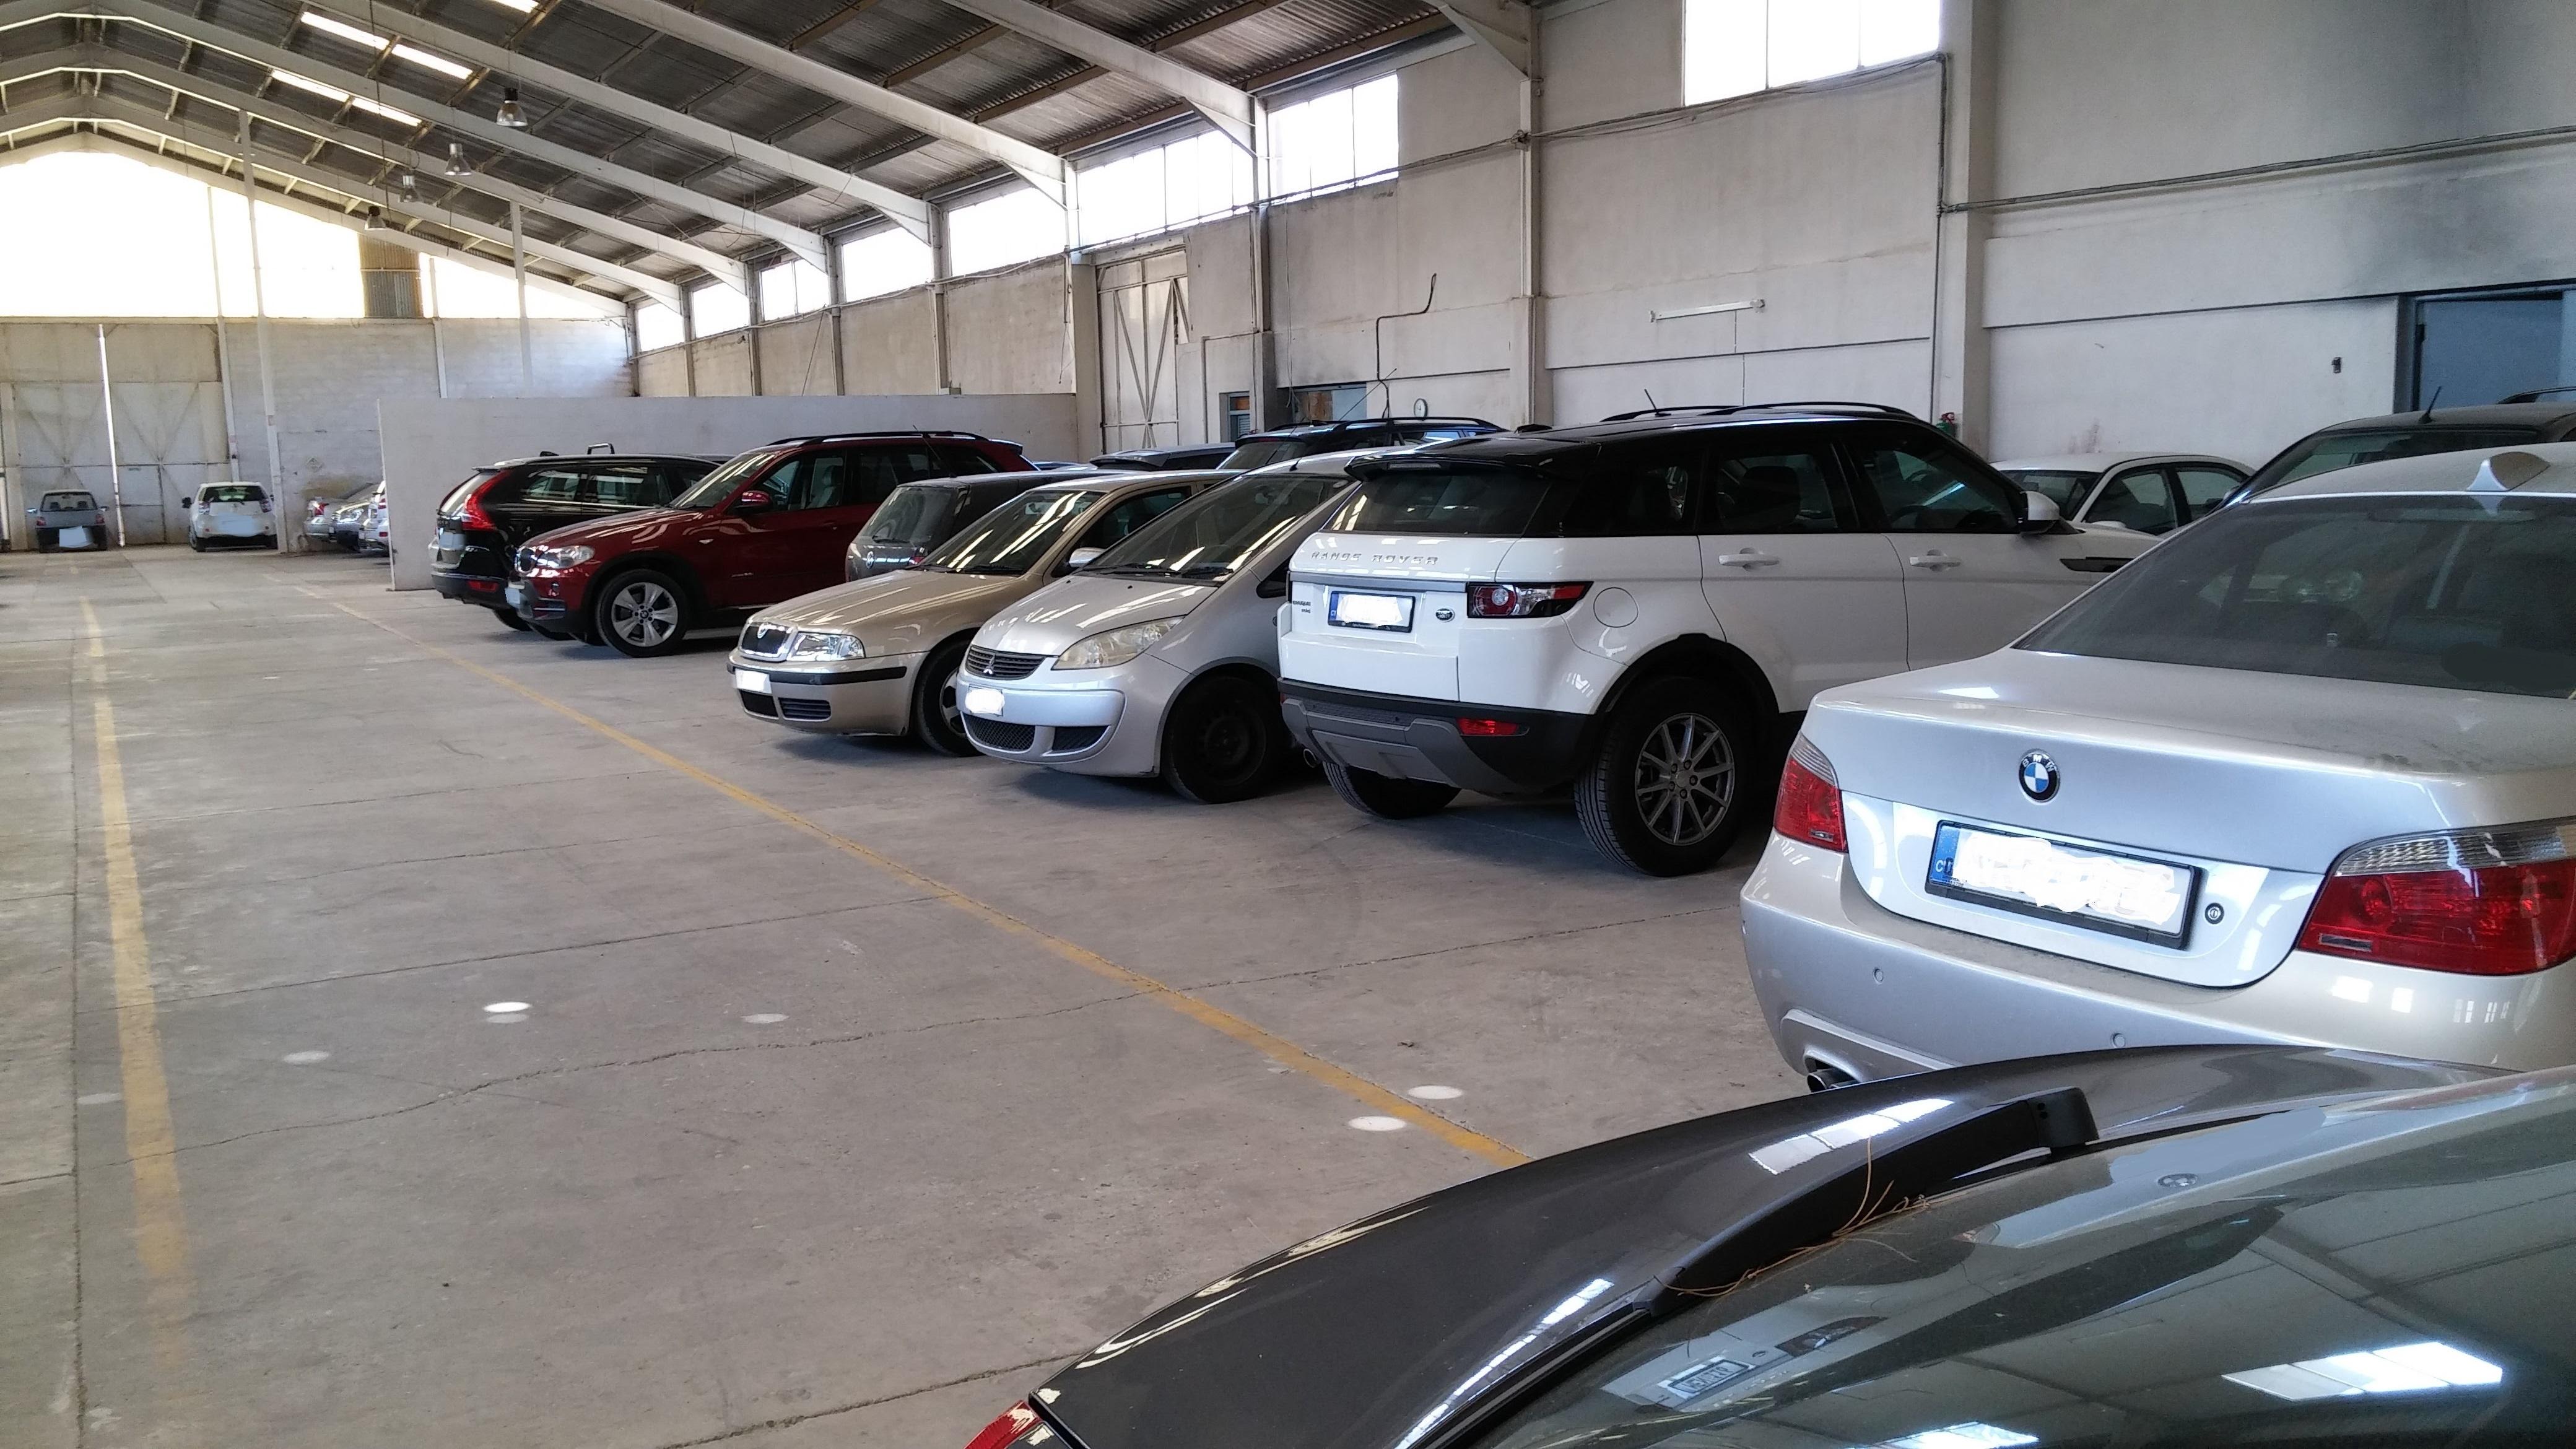 https://direct.parkcloud.com/images/operator/00000000-0000-0000-0000-000000000000/16964